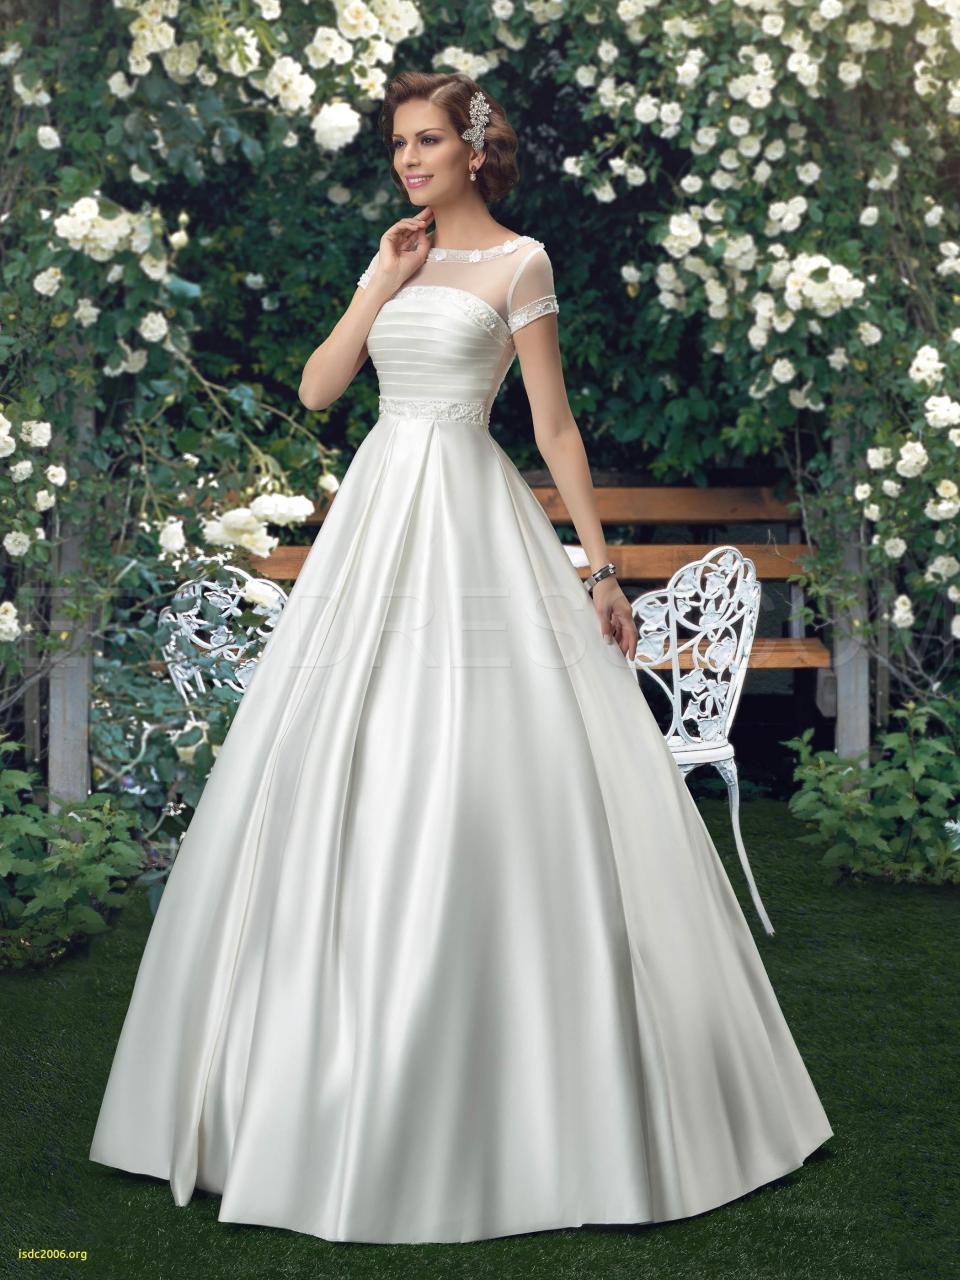 Discount Nwd29 2017 Fashionable Bride Short Sleeve See Through Satin Wedding Dress Church Plus Size Custom Made Bridal Gown Dresses Wedding Dresses